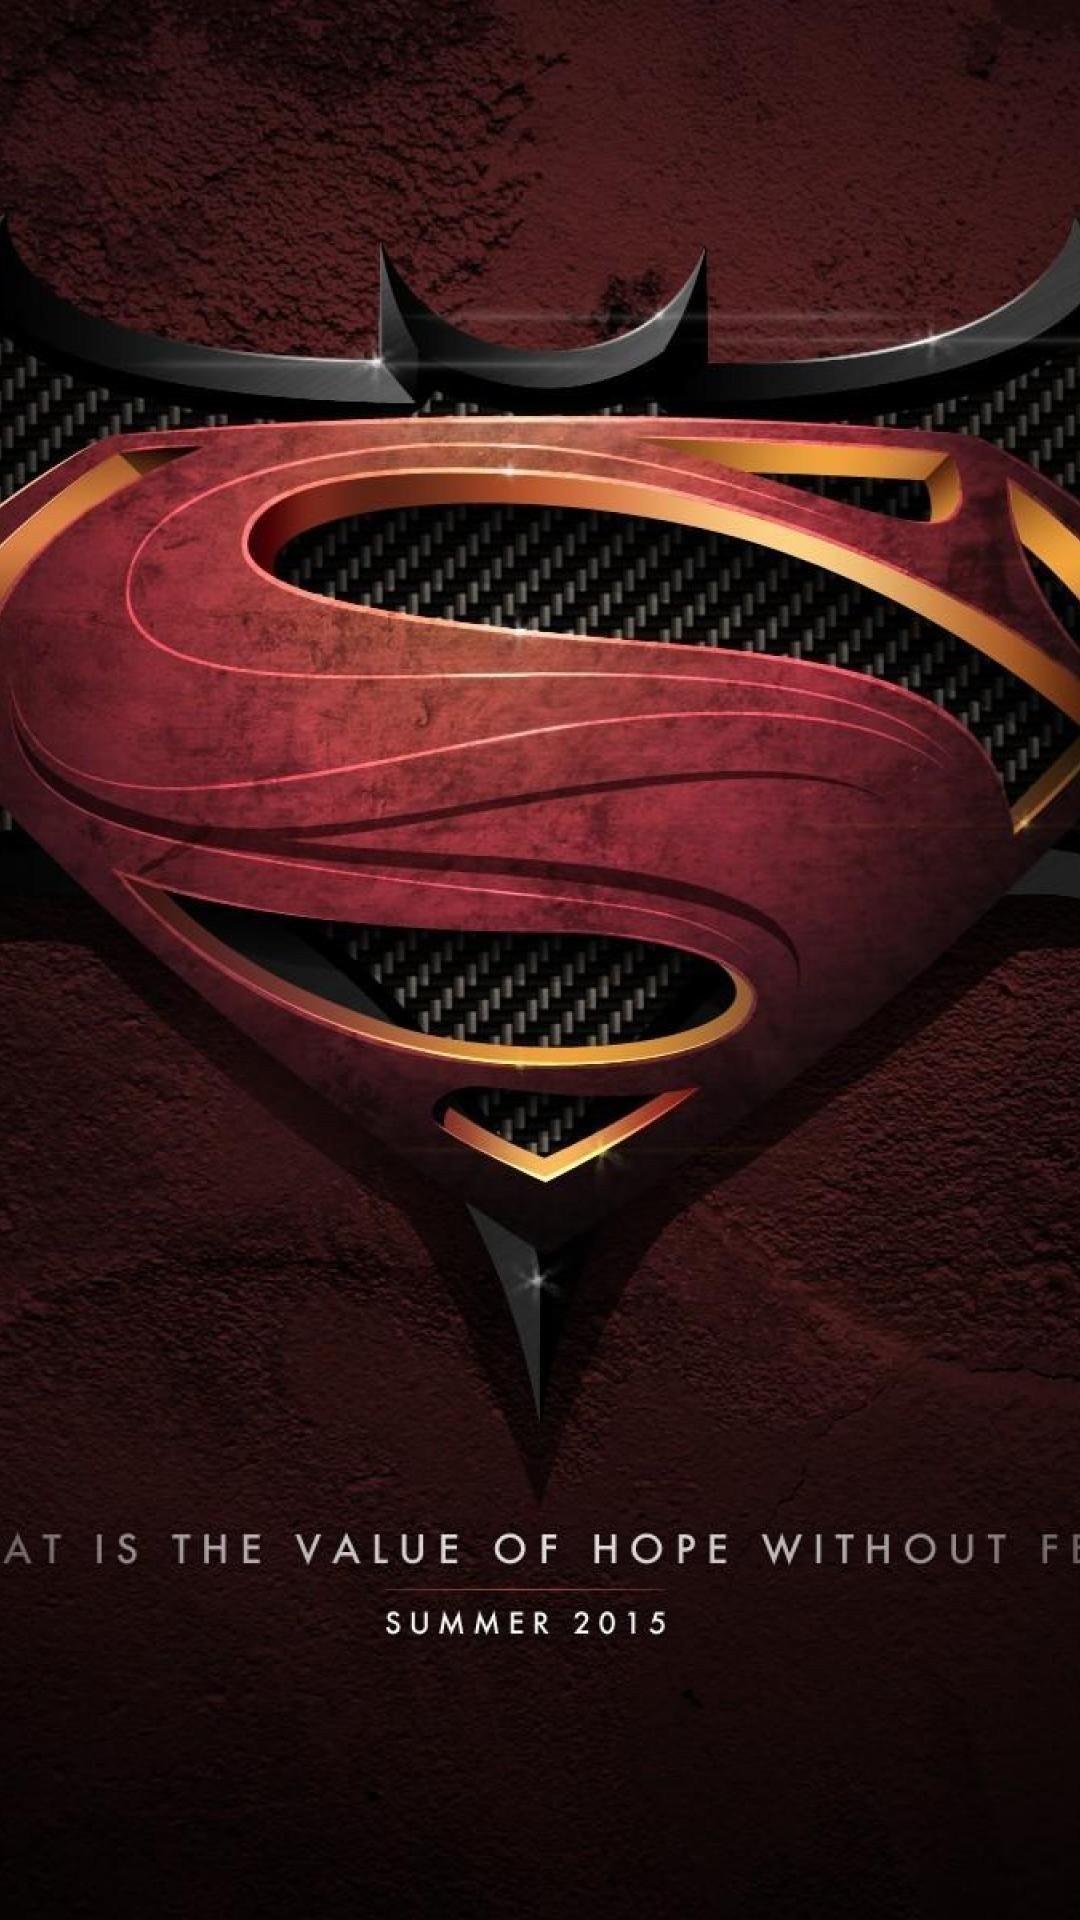 Batman and superman poster